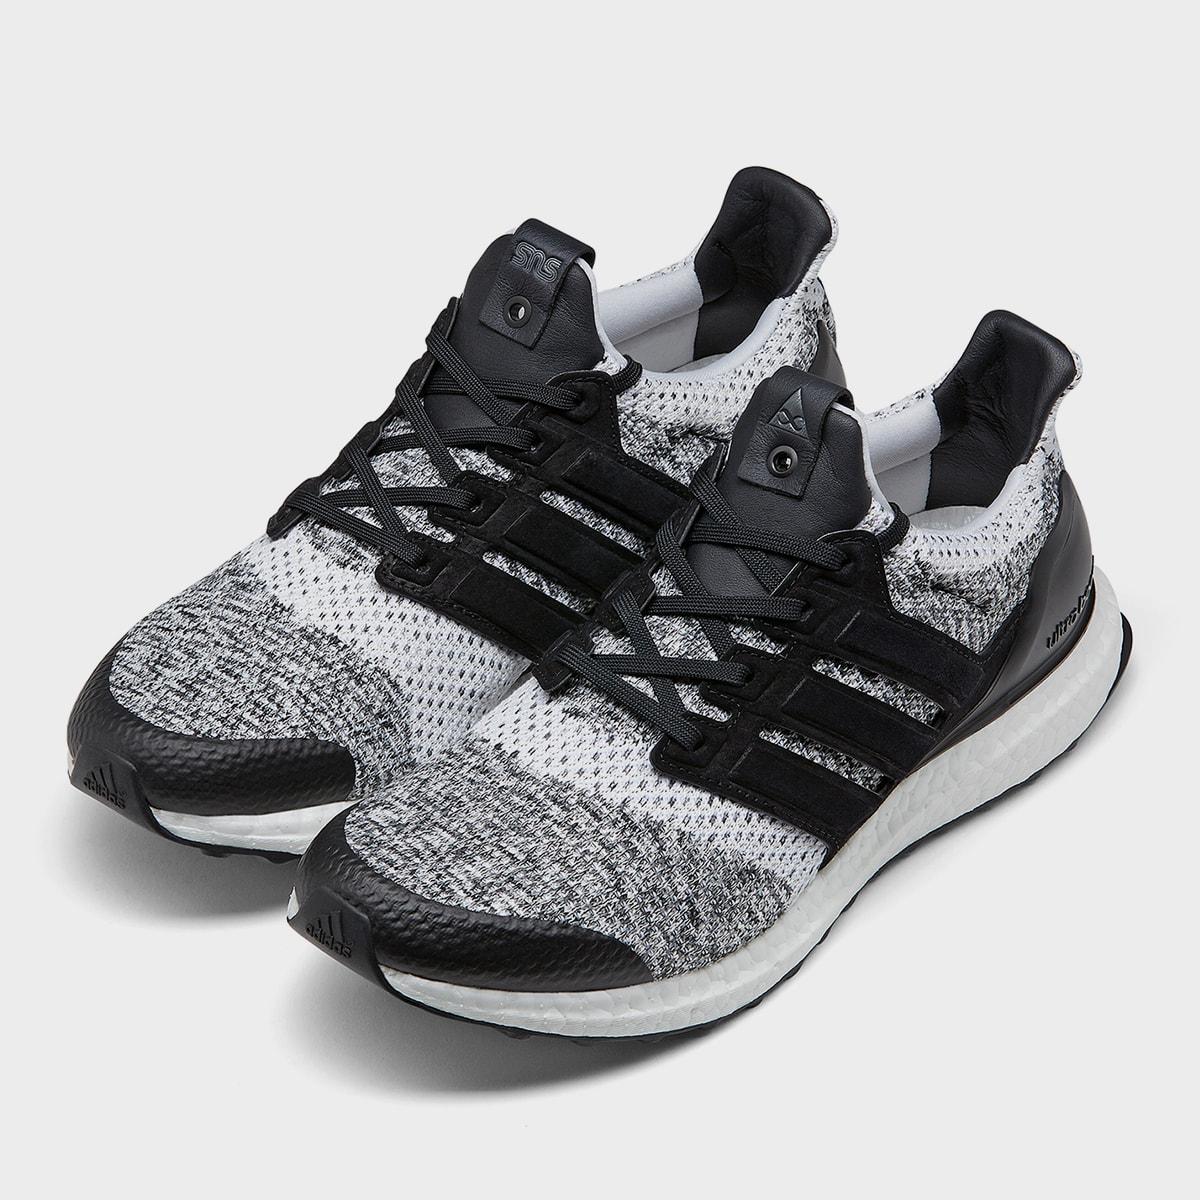 Adidas Consortium x Sneakersnstuff x Social Status Ultraboost S.E. ...